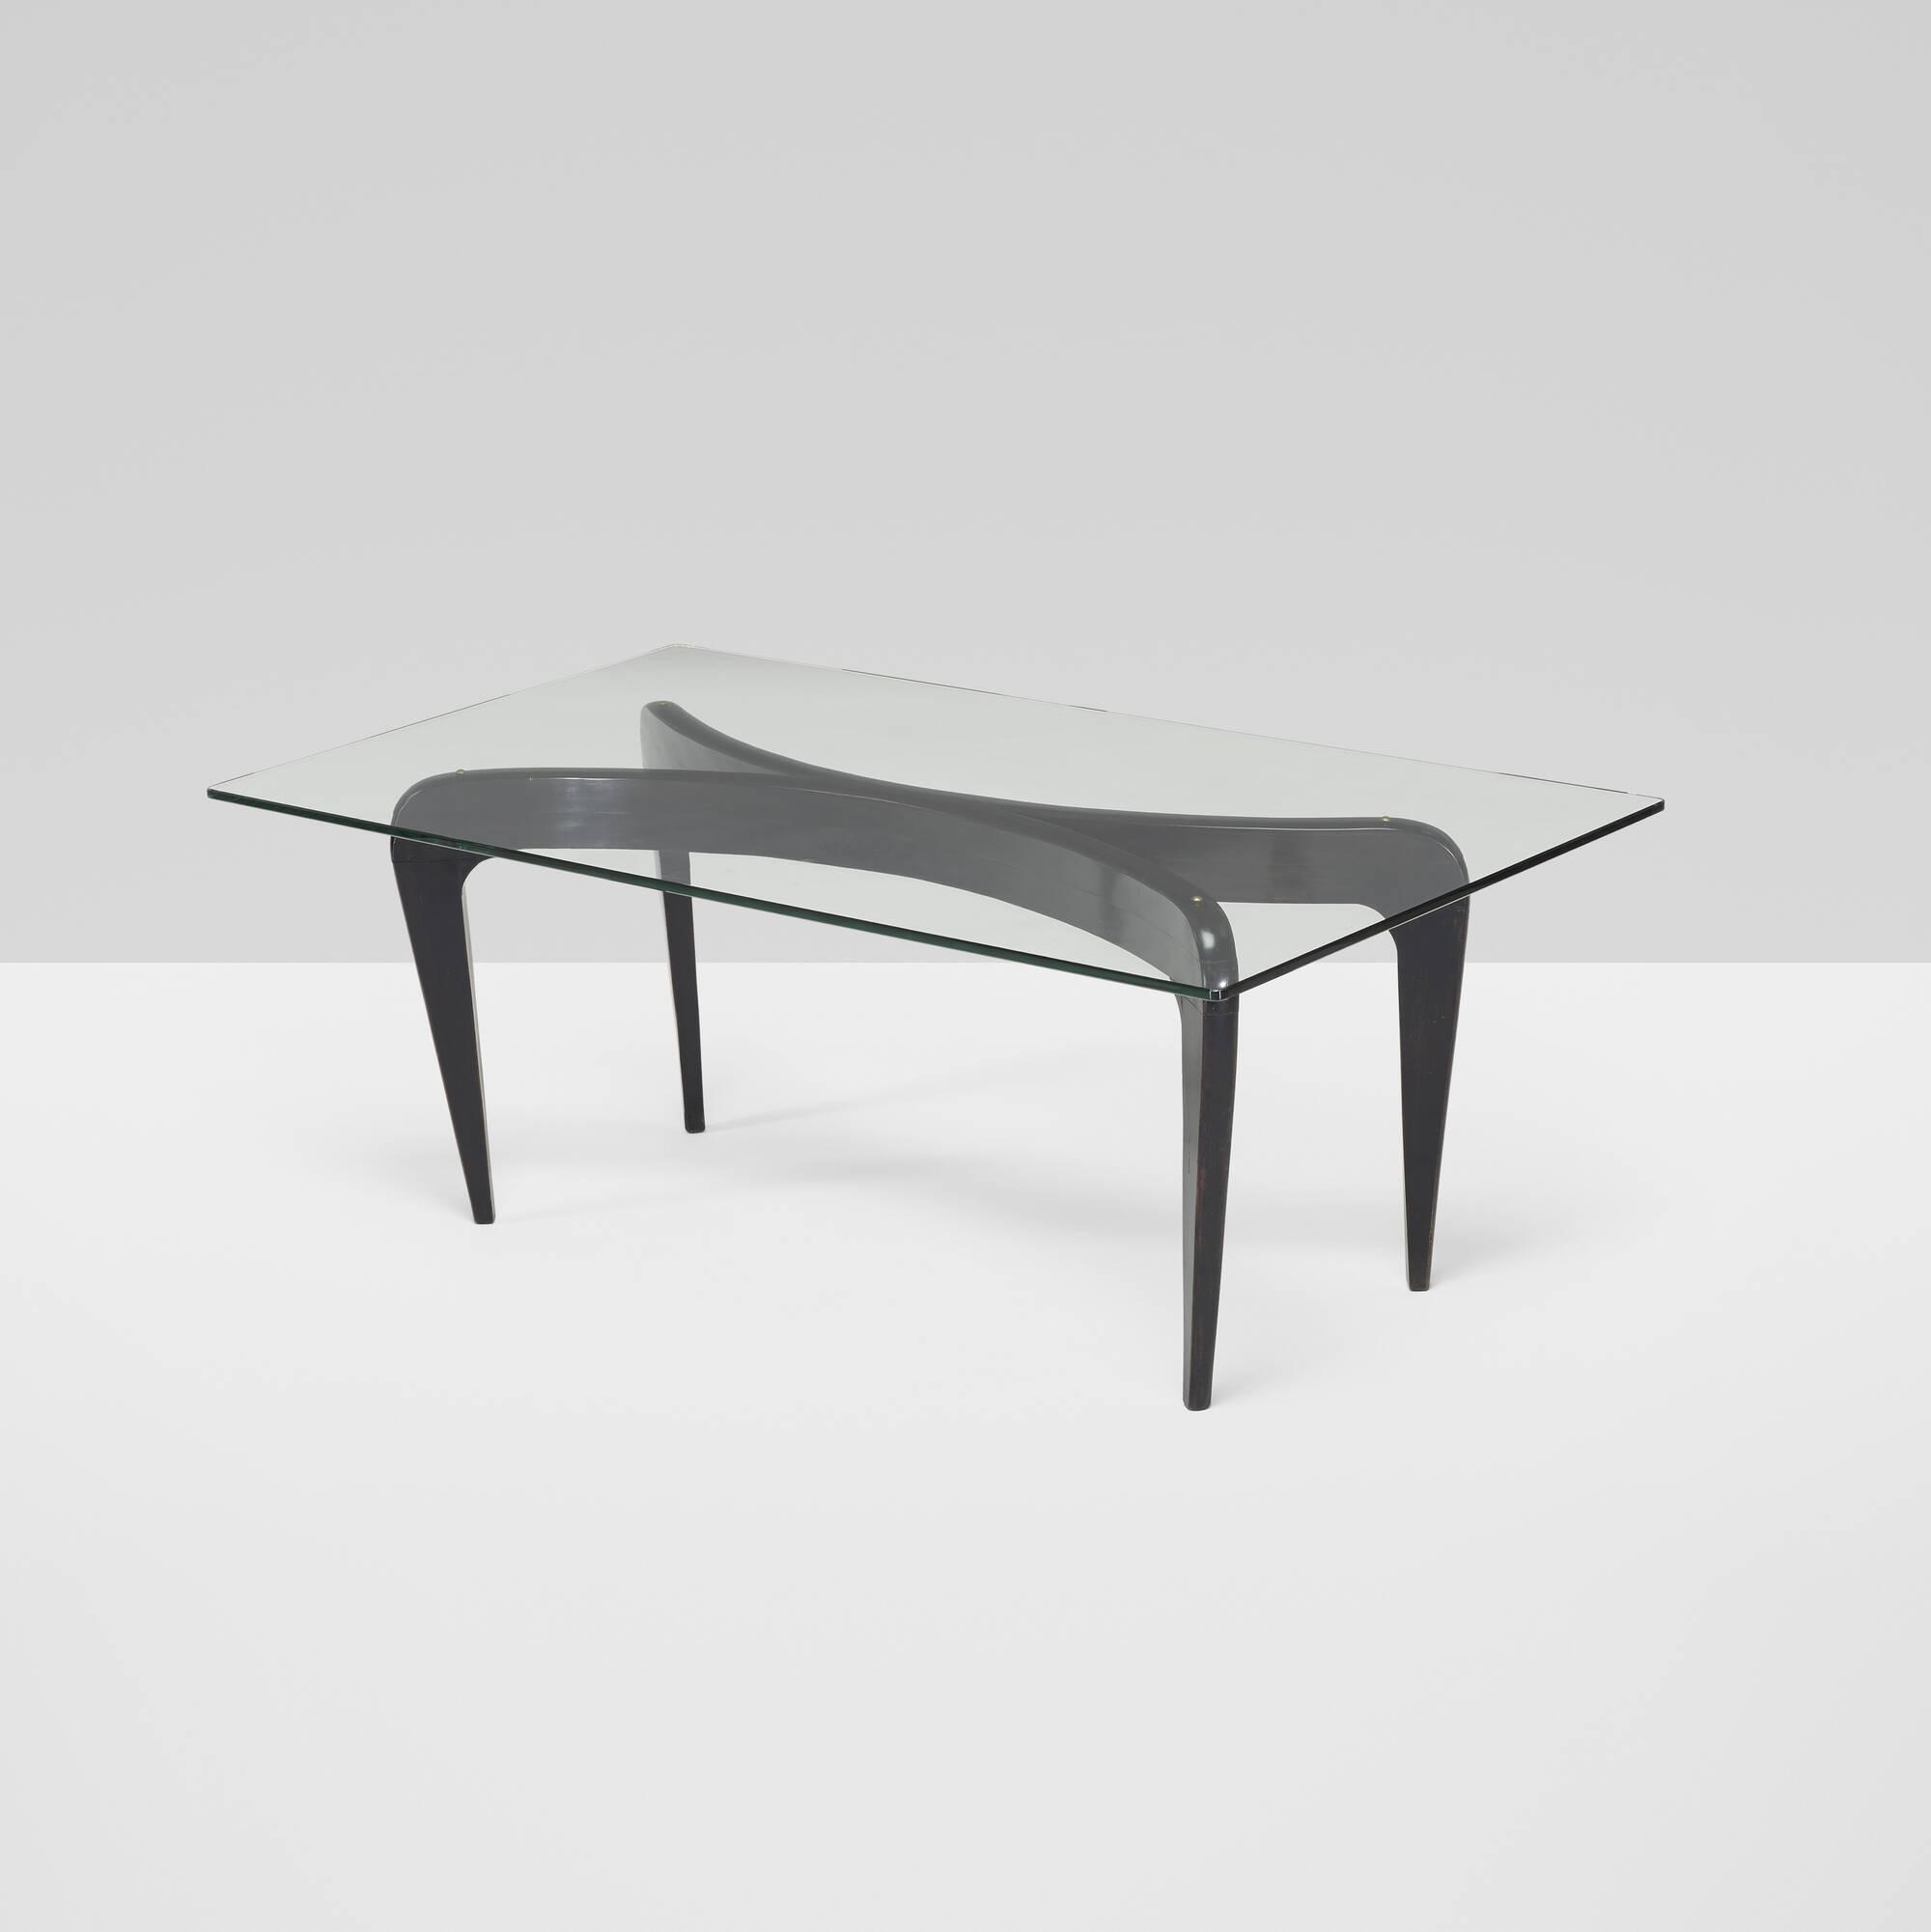 247: Gio Ponti / coffee table (1 of 1)